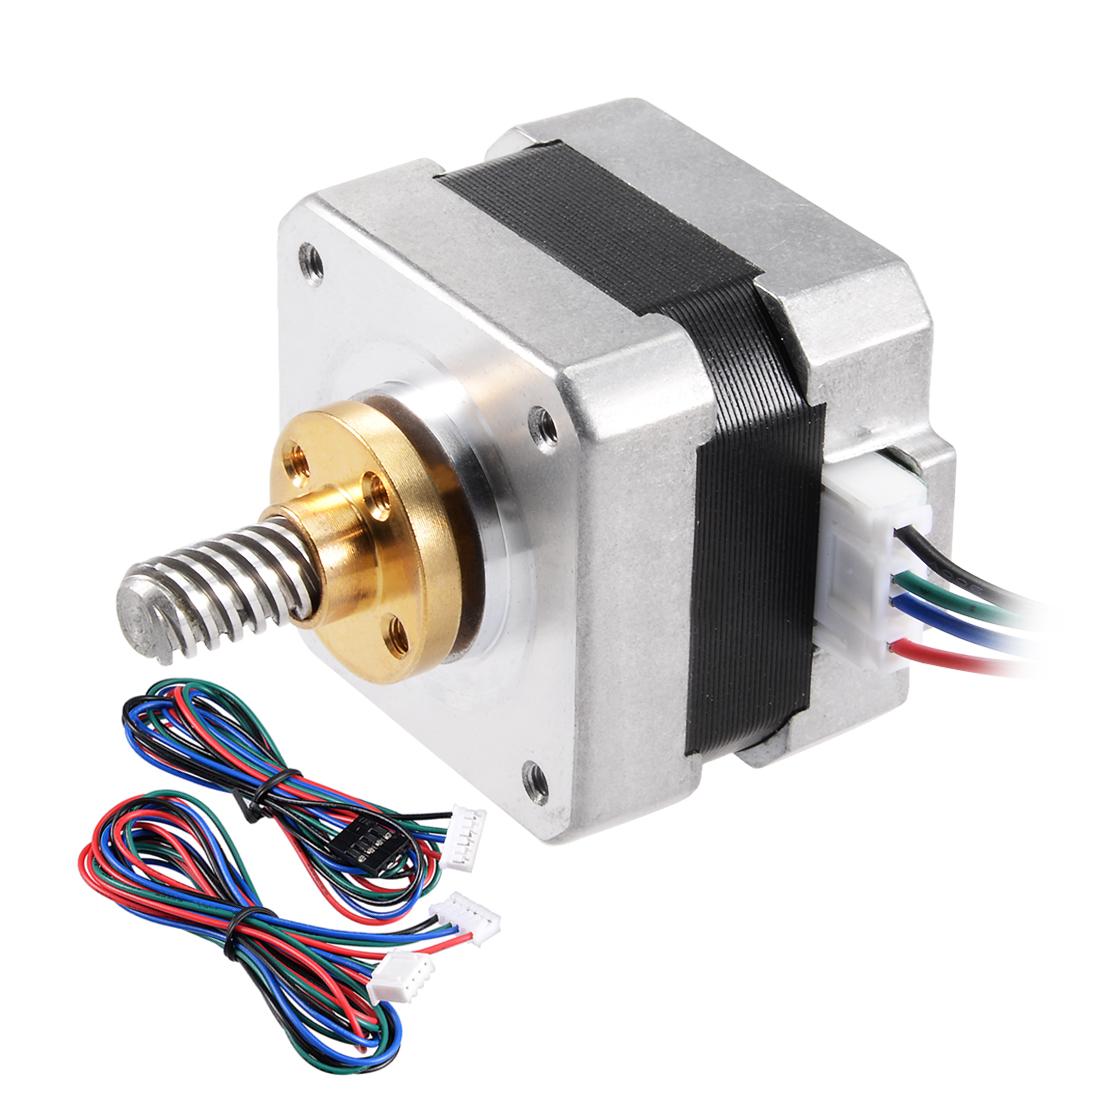 Unique Bargains Stepper Motor 42 Bipolar 25mm 0.56NM 1.5A 2.5V 4 Lead Cable for 3D Printer - image 1 de 7